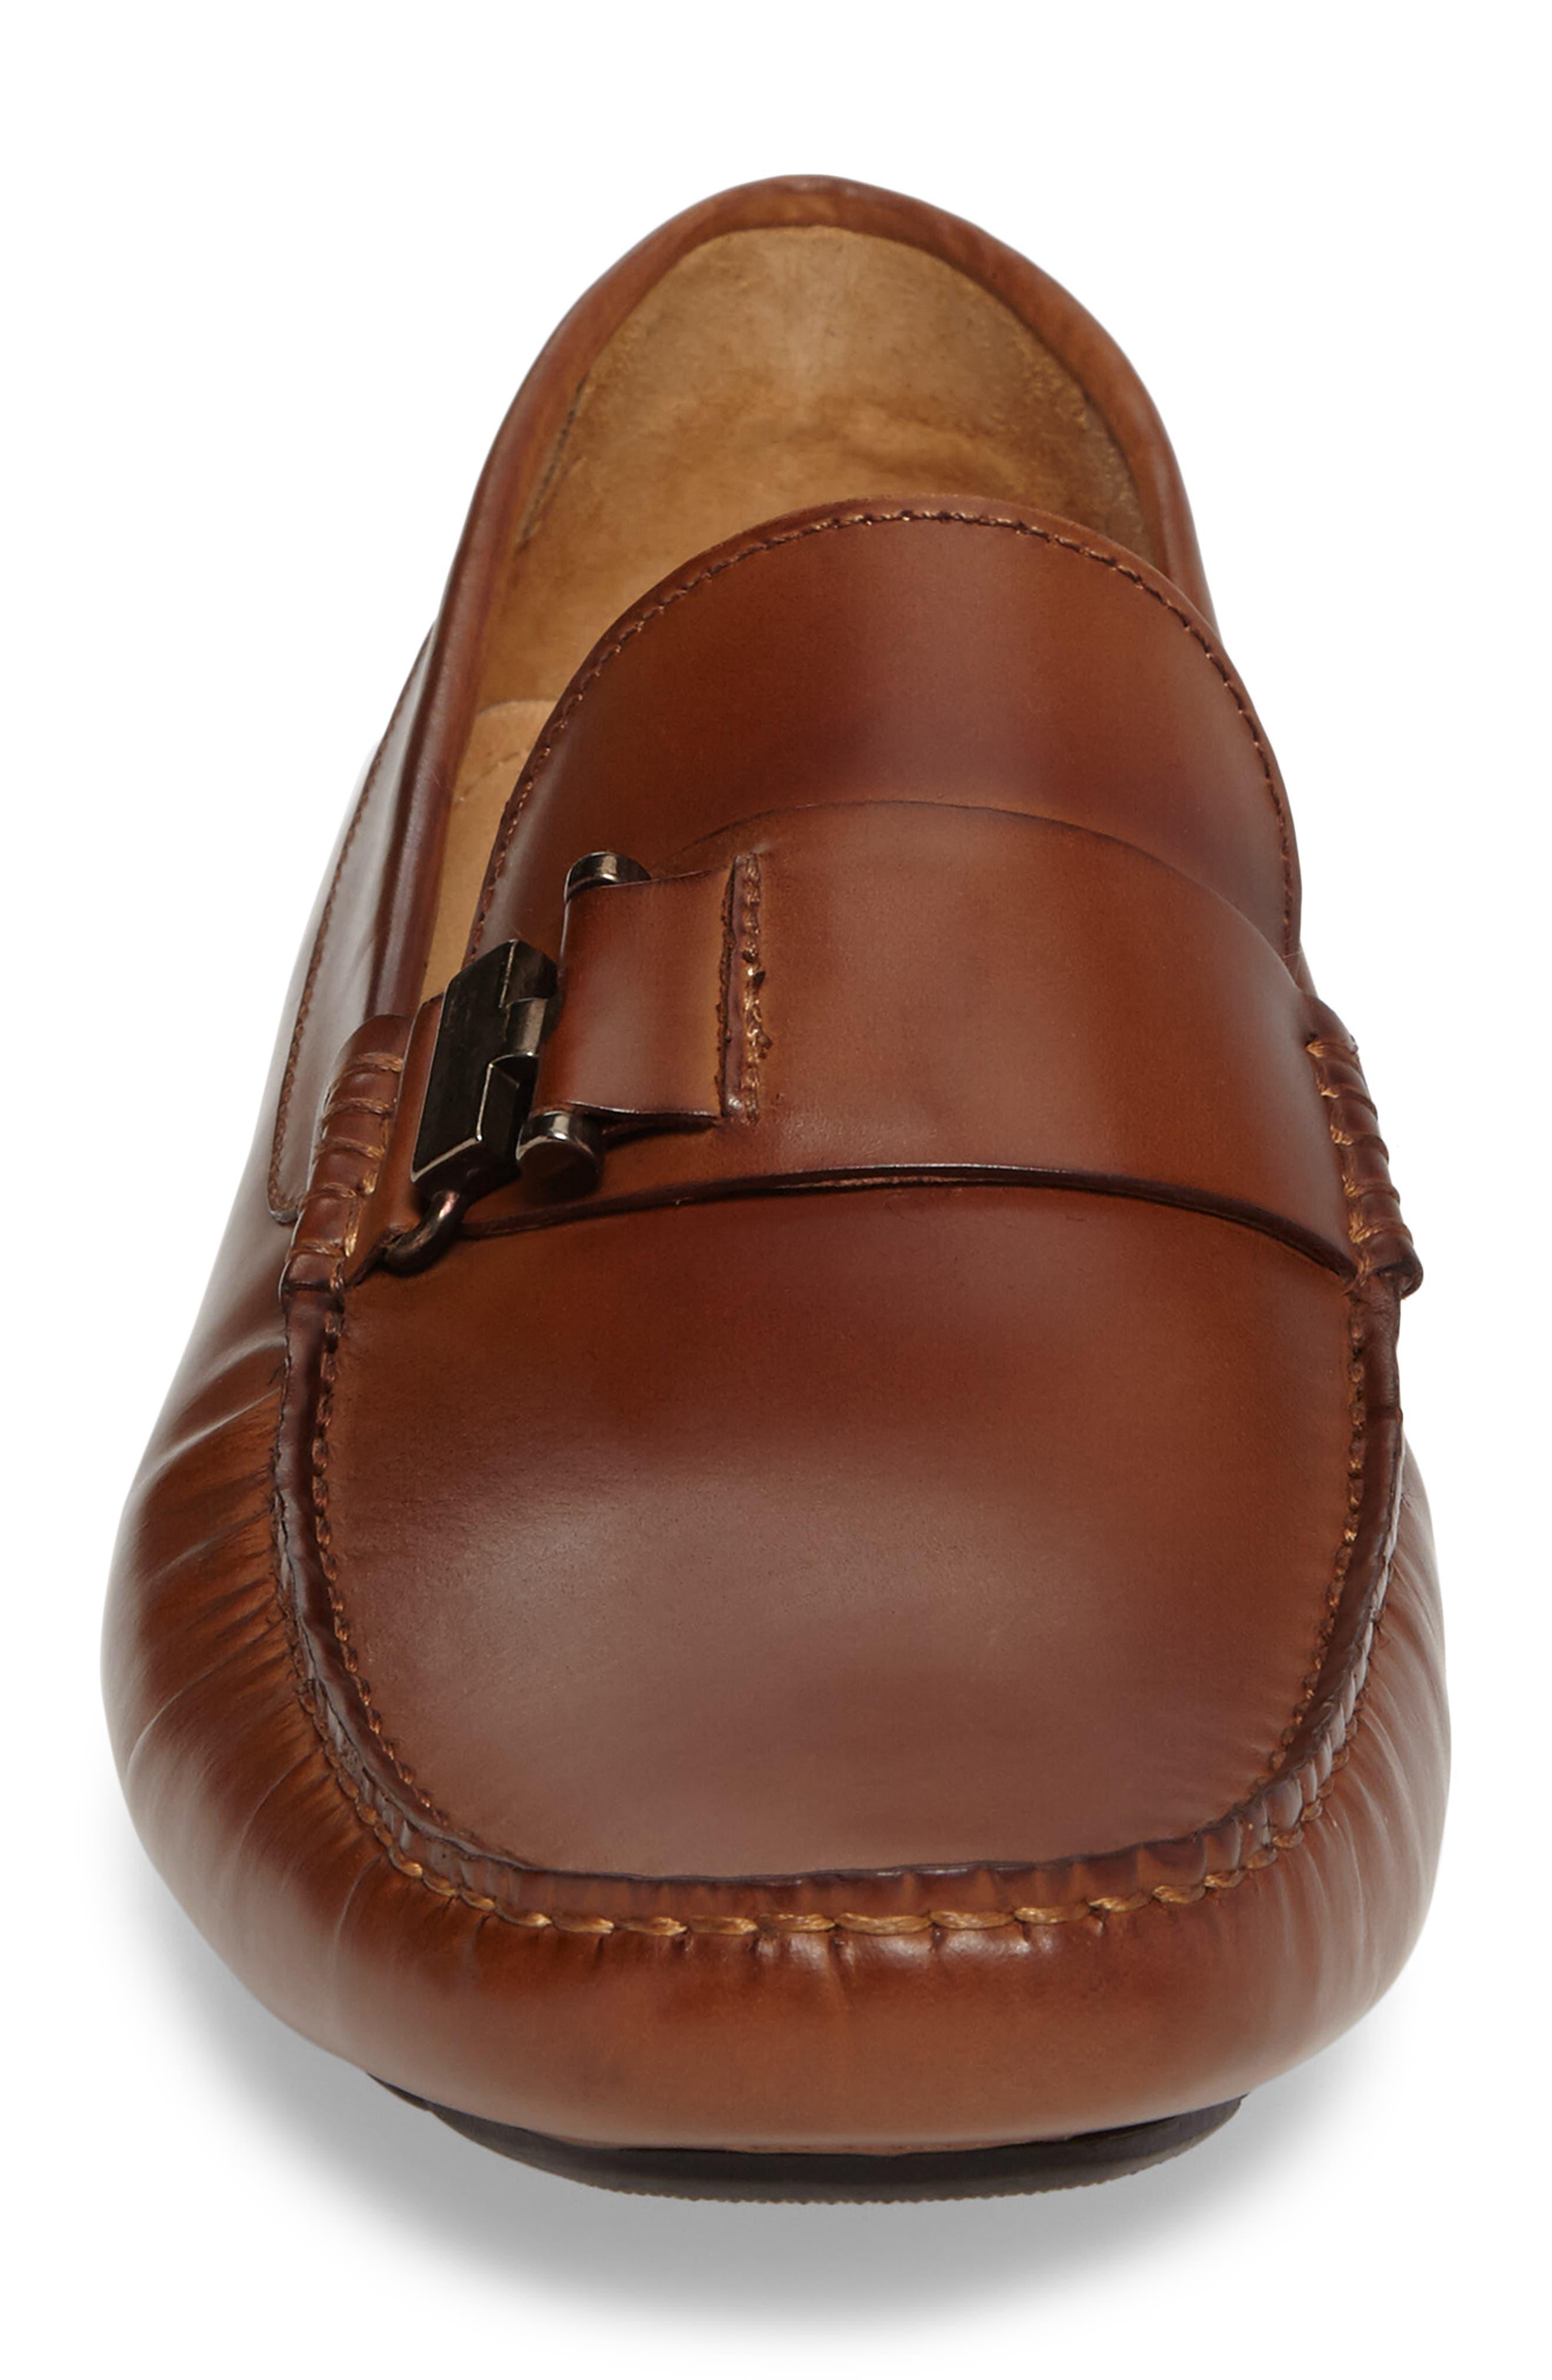 'In Theme' Driving Shoe,                             Alternate thumbnail 4, color,                             Cognac Leather